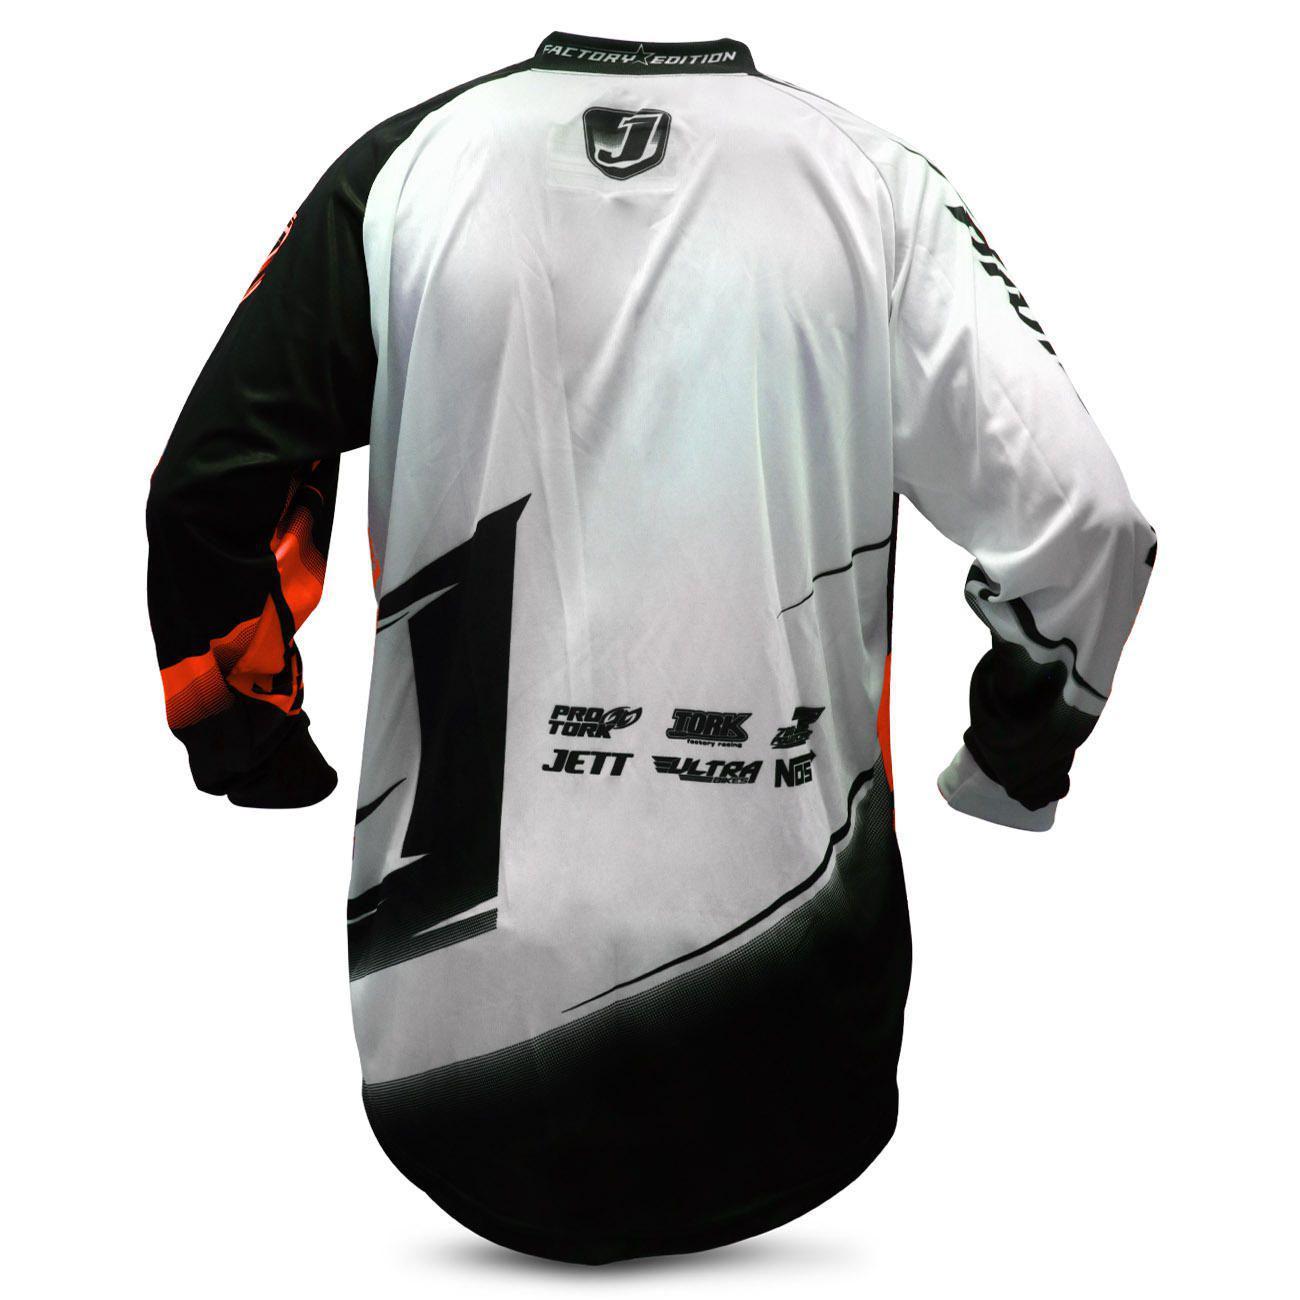 760fb6989 Camisa Motocross Pro Tork Jett Factory Edition Neon Laranja e Preto Trilha  Enduro Produto não disponível